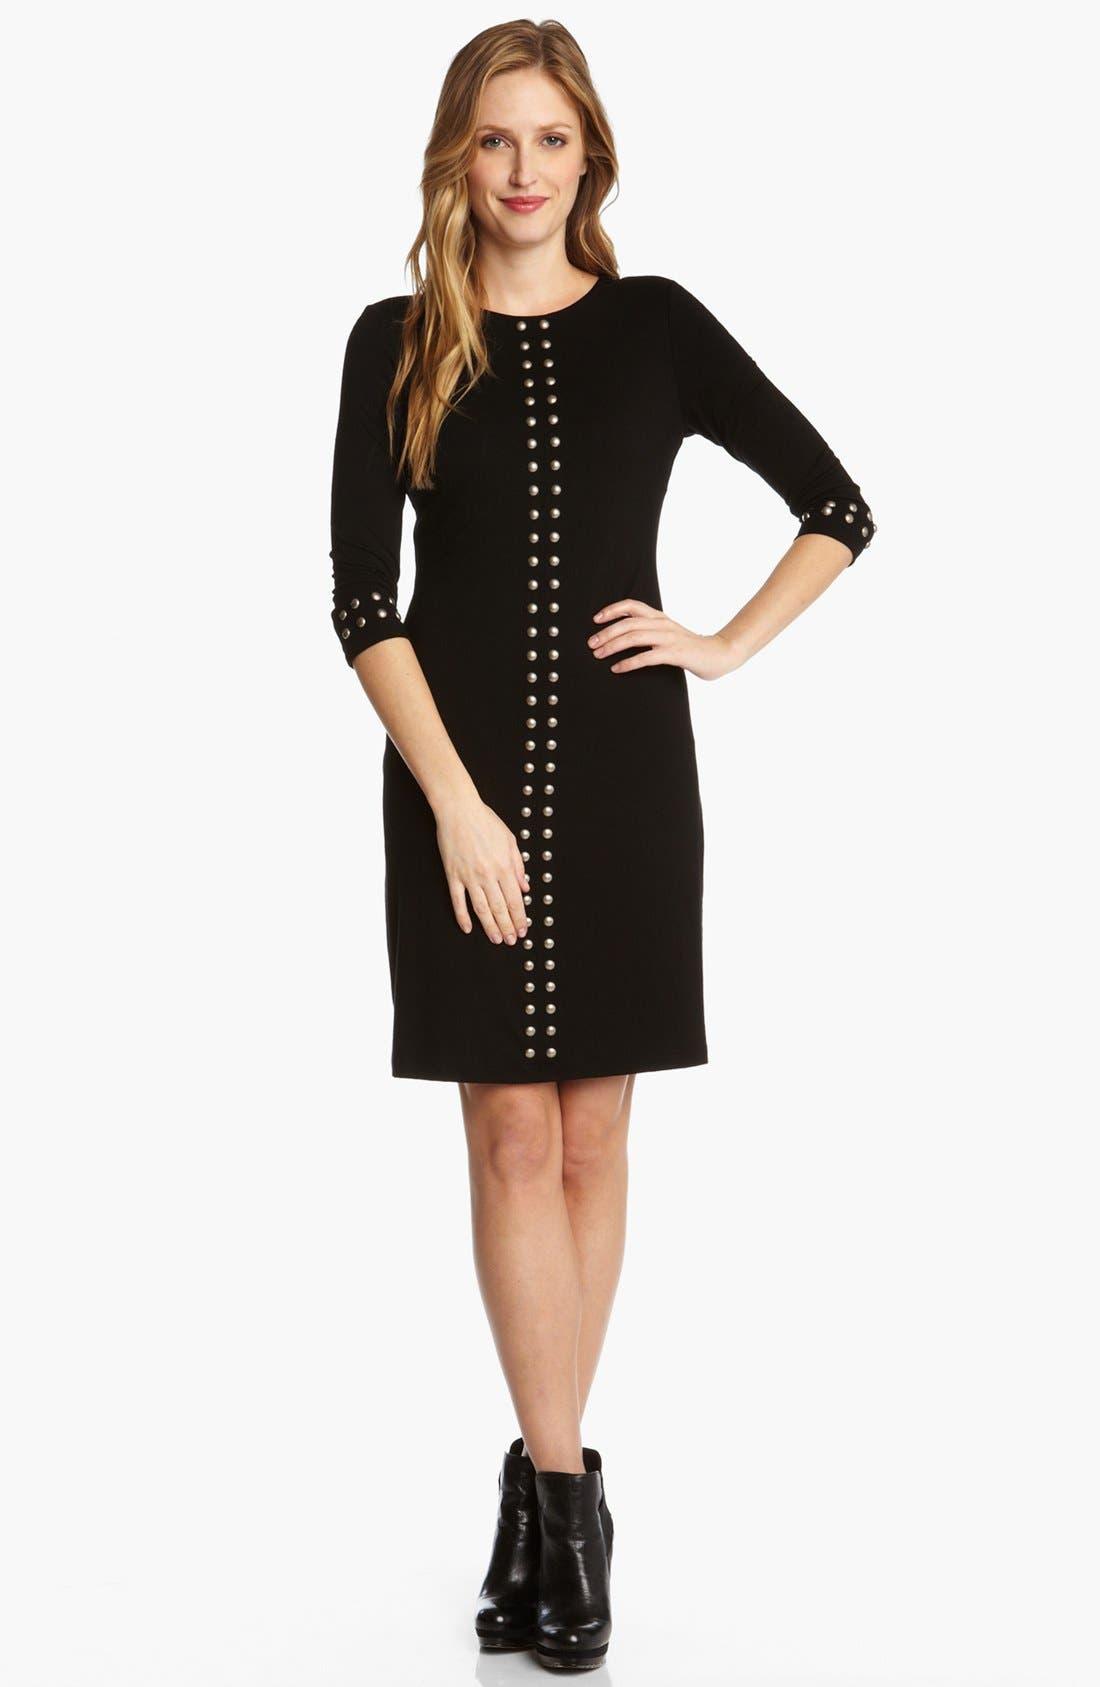 Alternate Image 1 Selected - Karen Kane 'Left Bank' Studded Jersey Dress